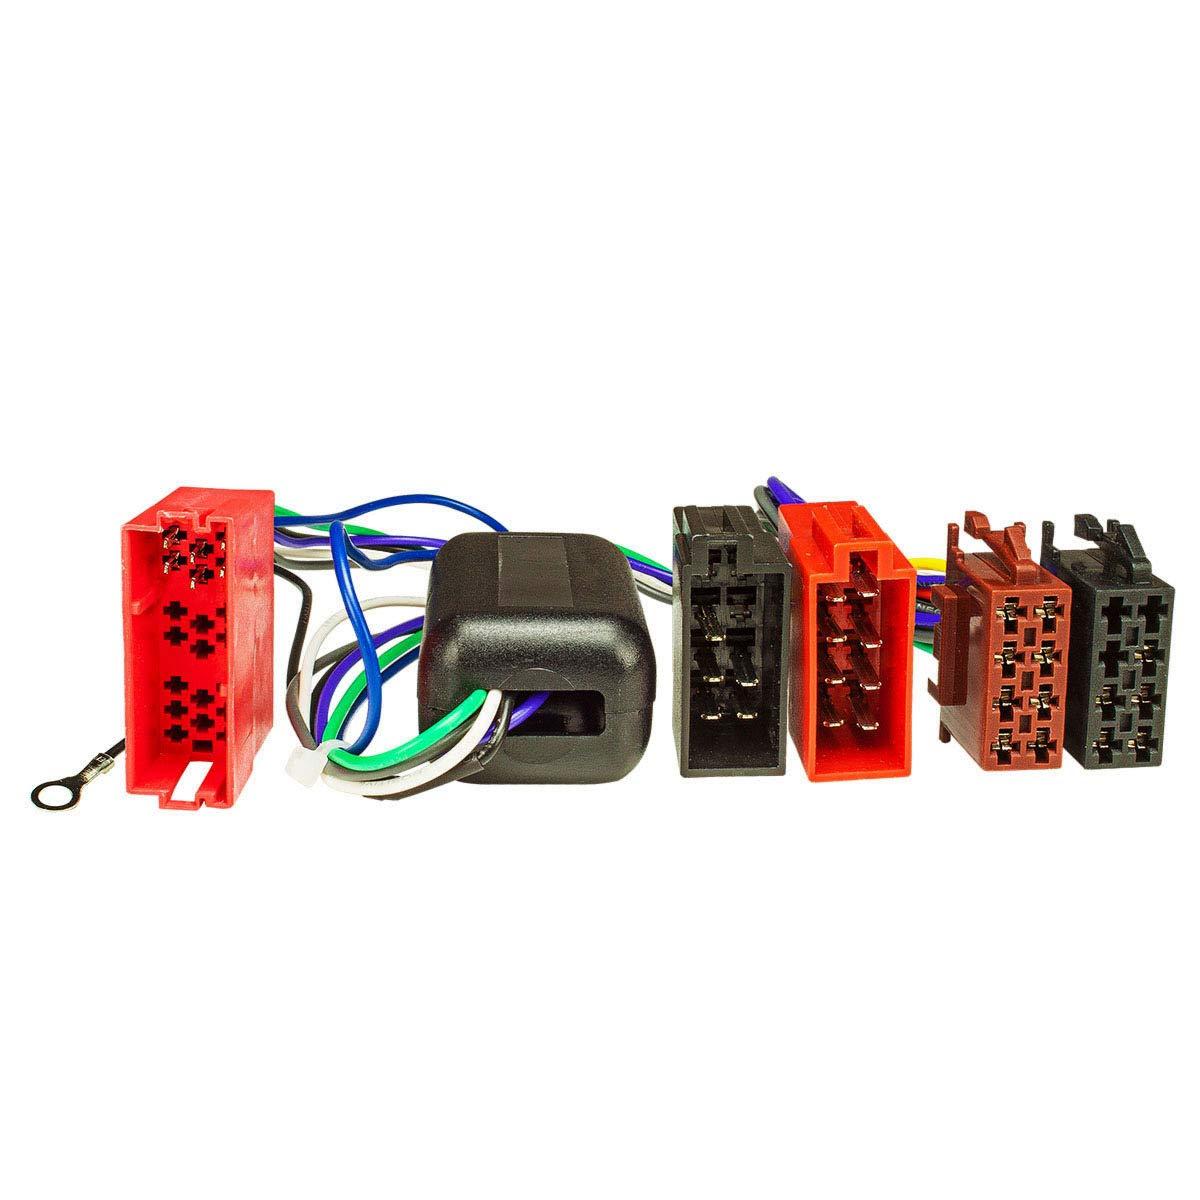 4 x 100 Watt max. Sistema attivo Adattatore Radio Audi A2 A3 A4 A6 A8 mini-ISO